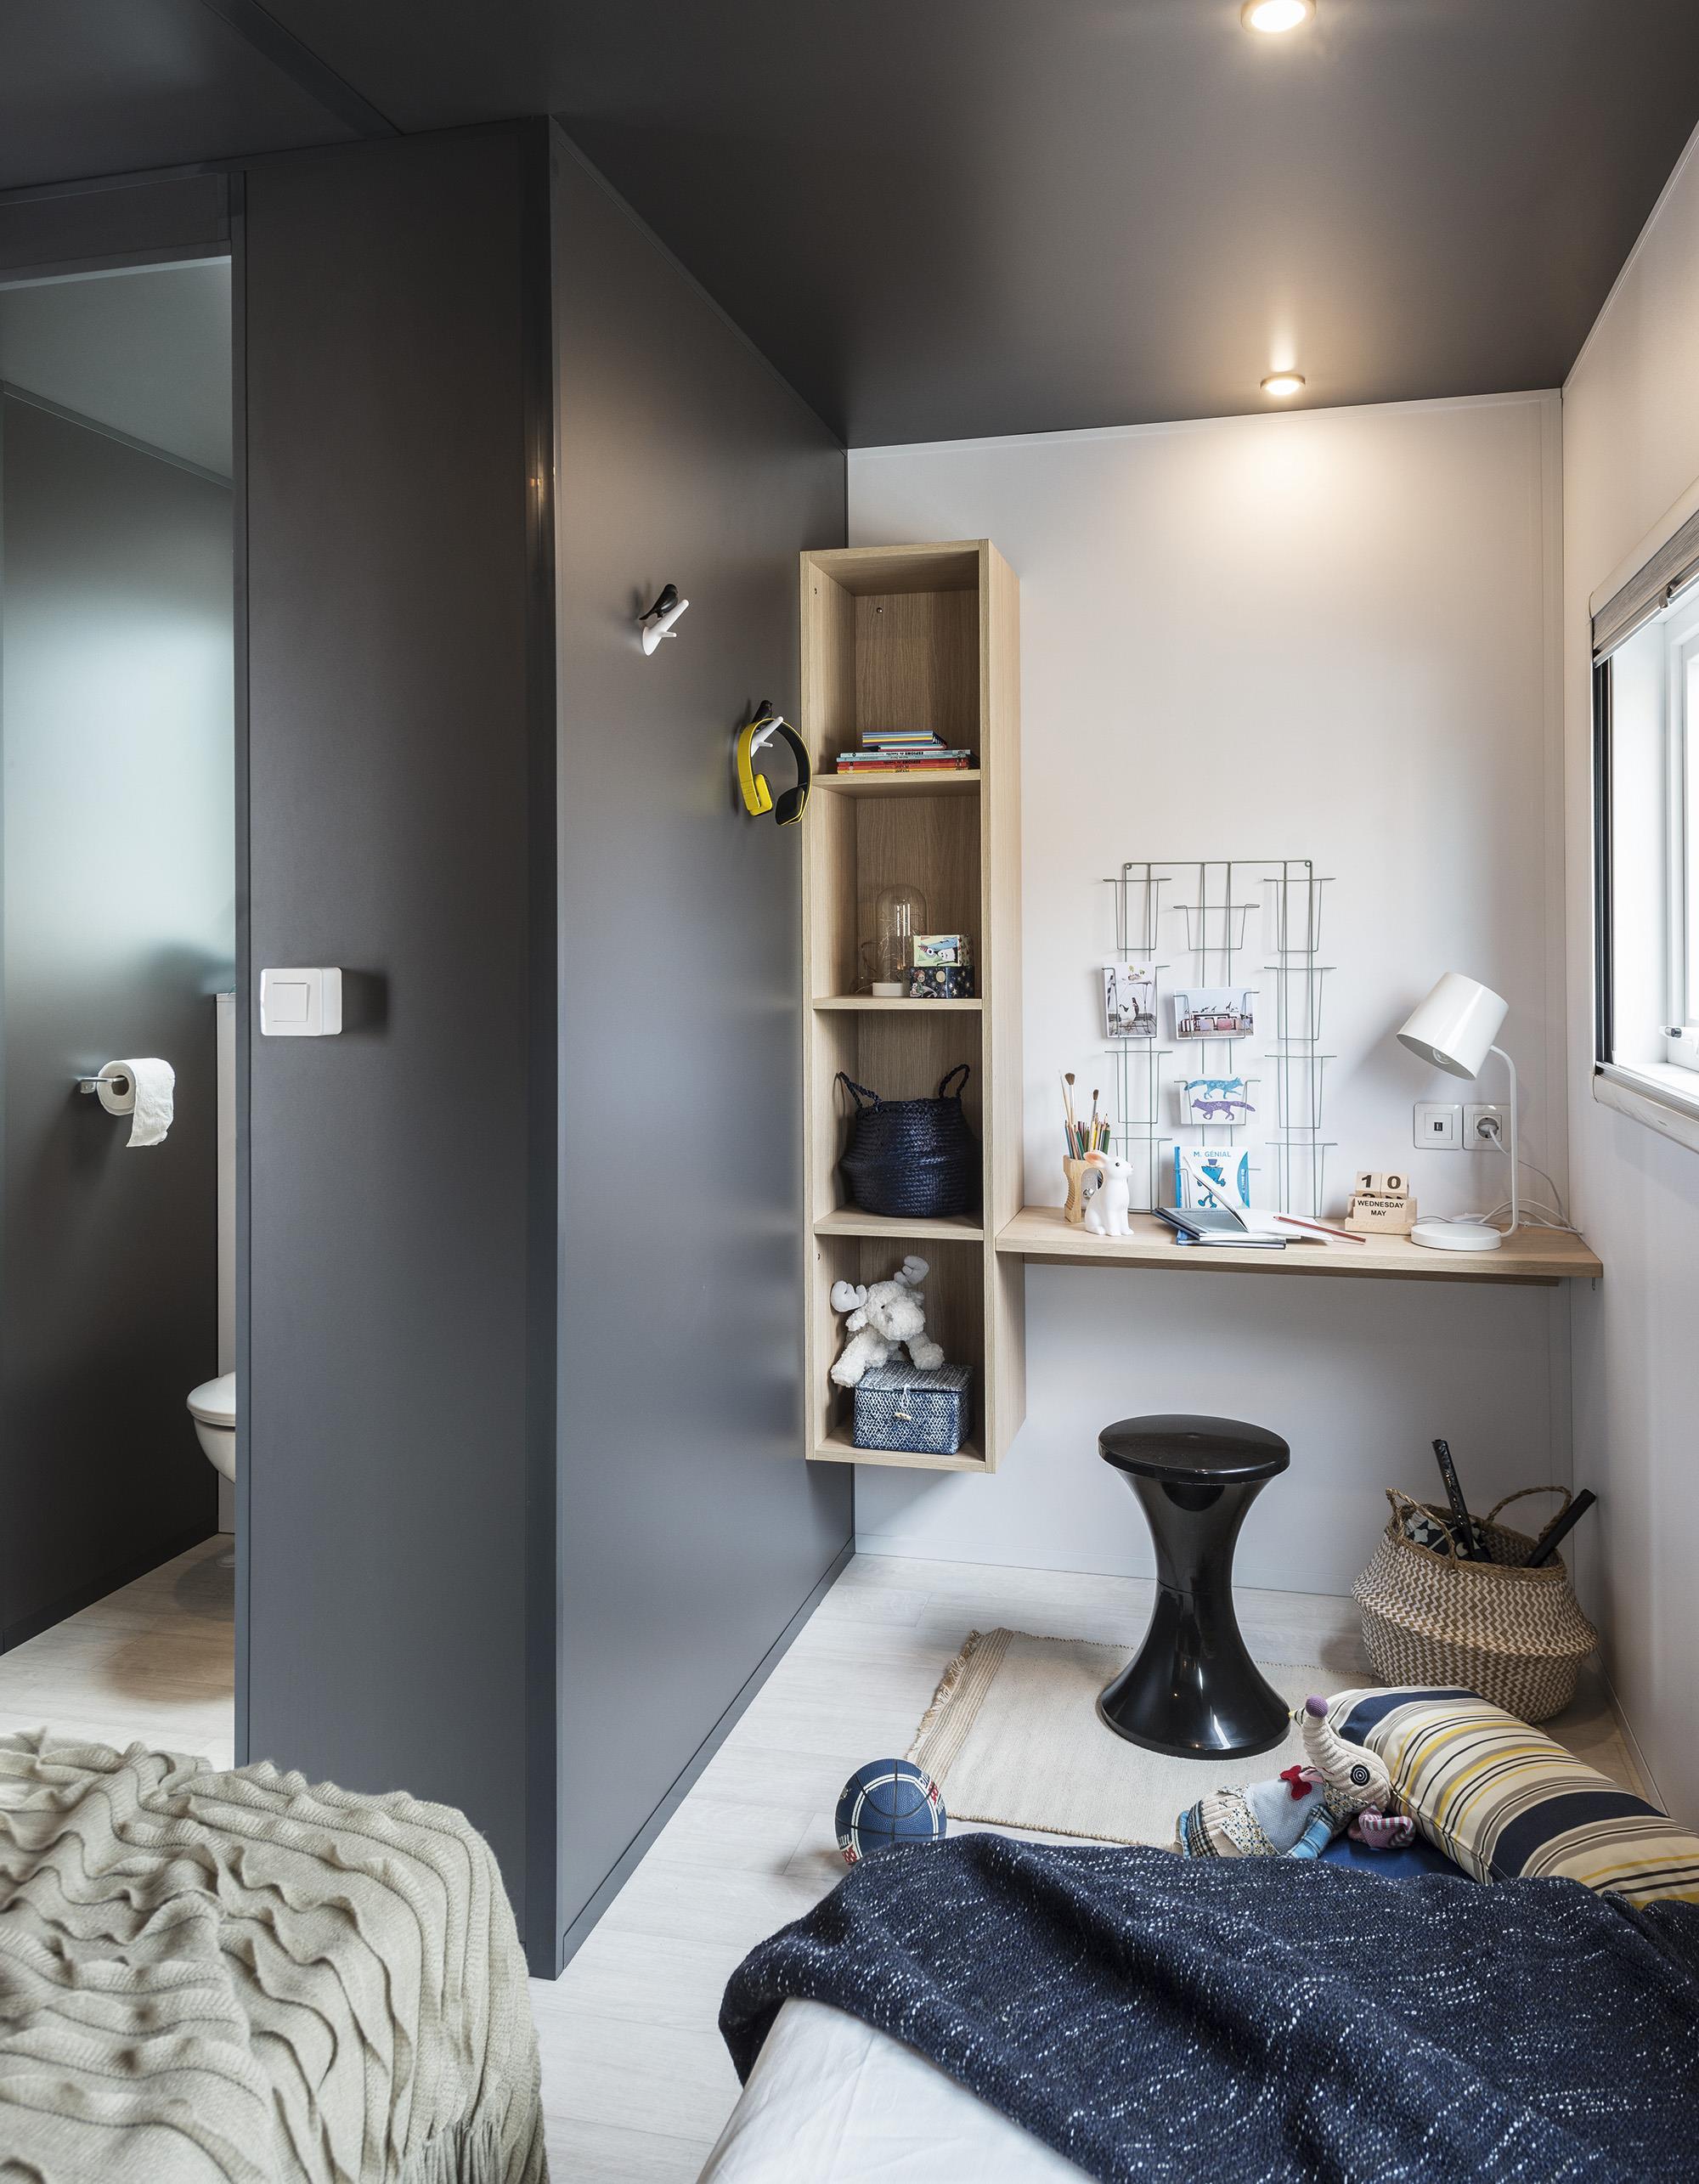 Location - Cottage Carrousel 2 Chambres 2 Salles De Bain - 40M² - Nantes Camping